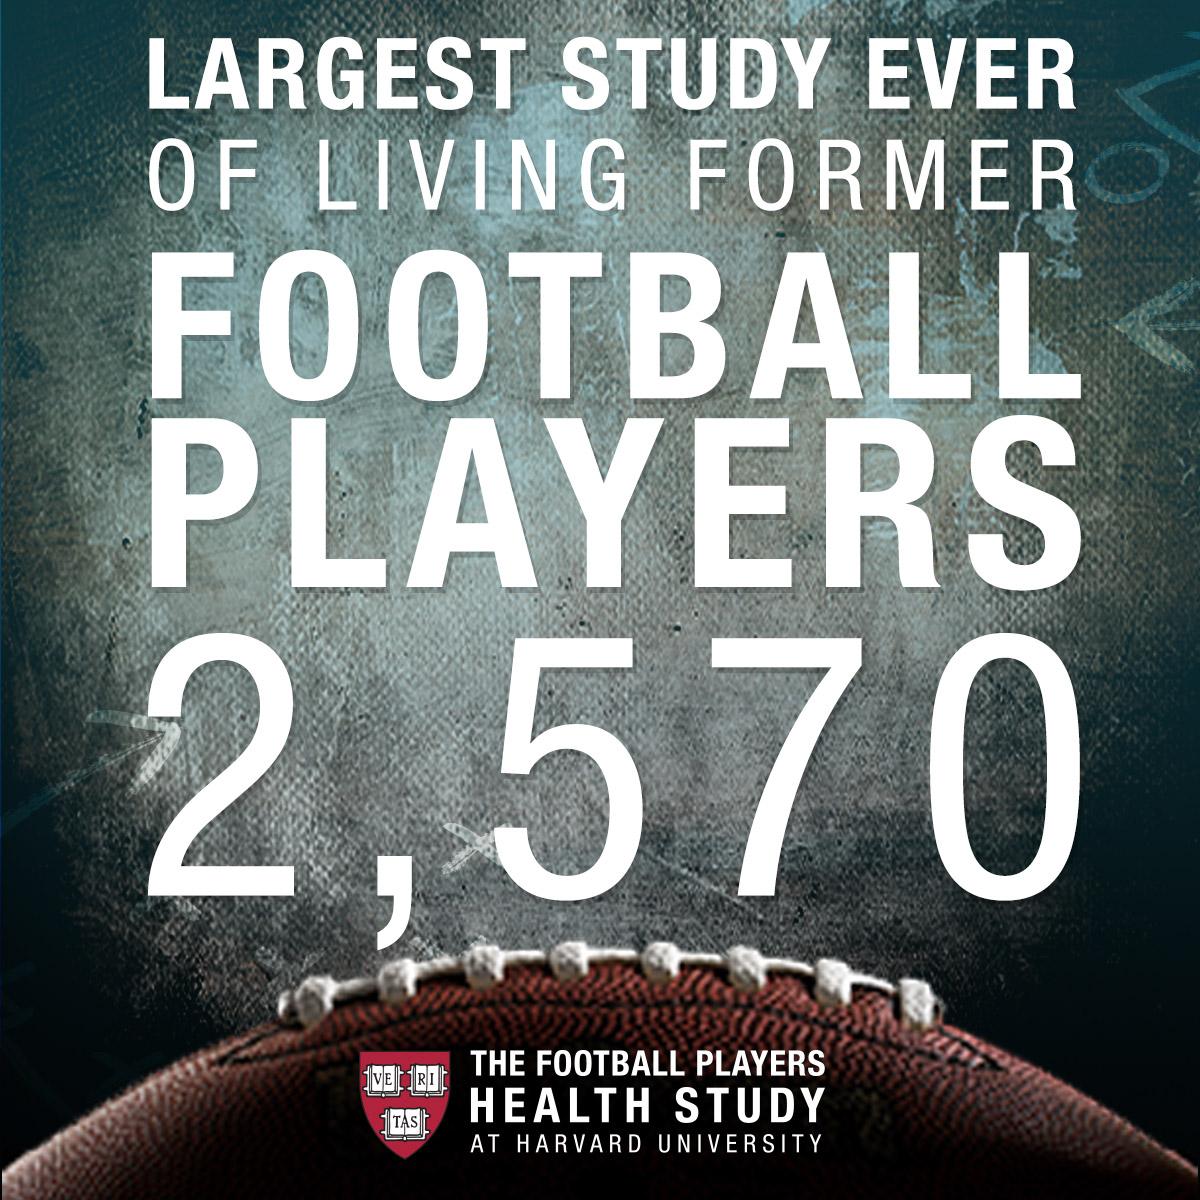 Football Players Health Study on Vimeo